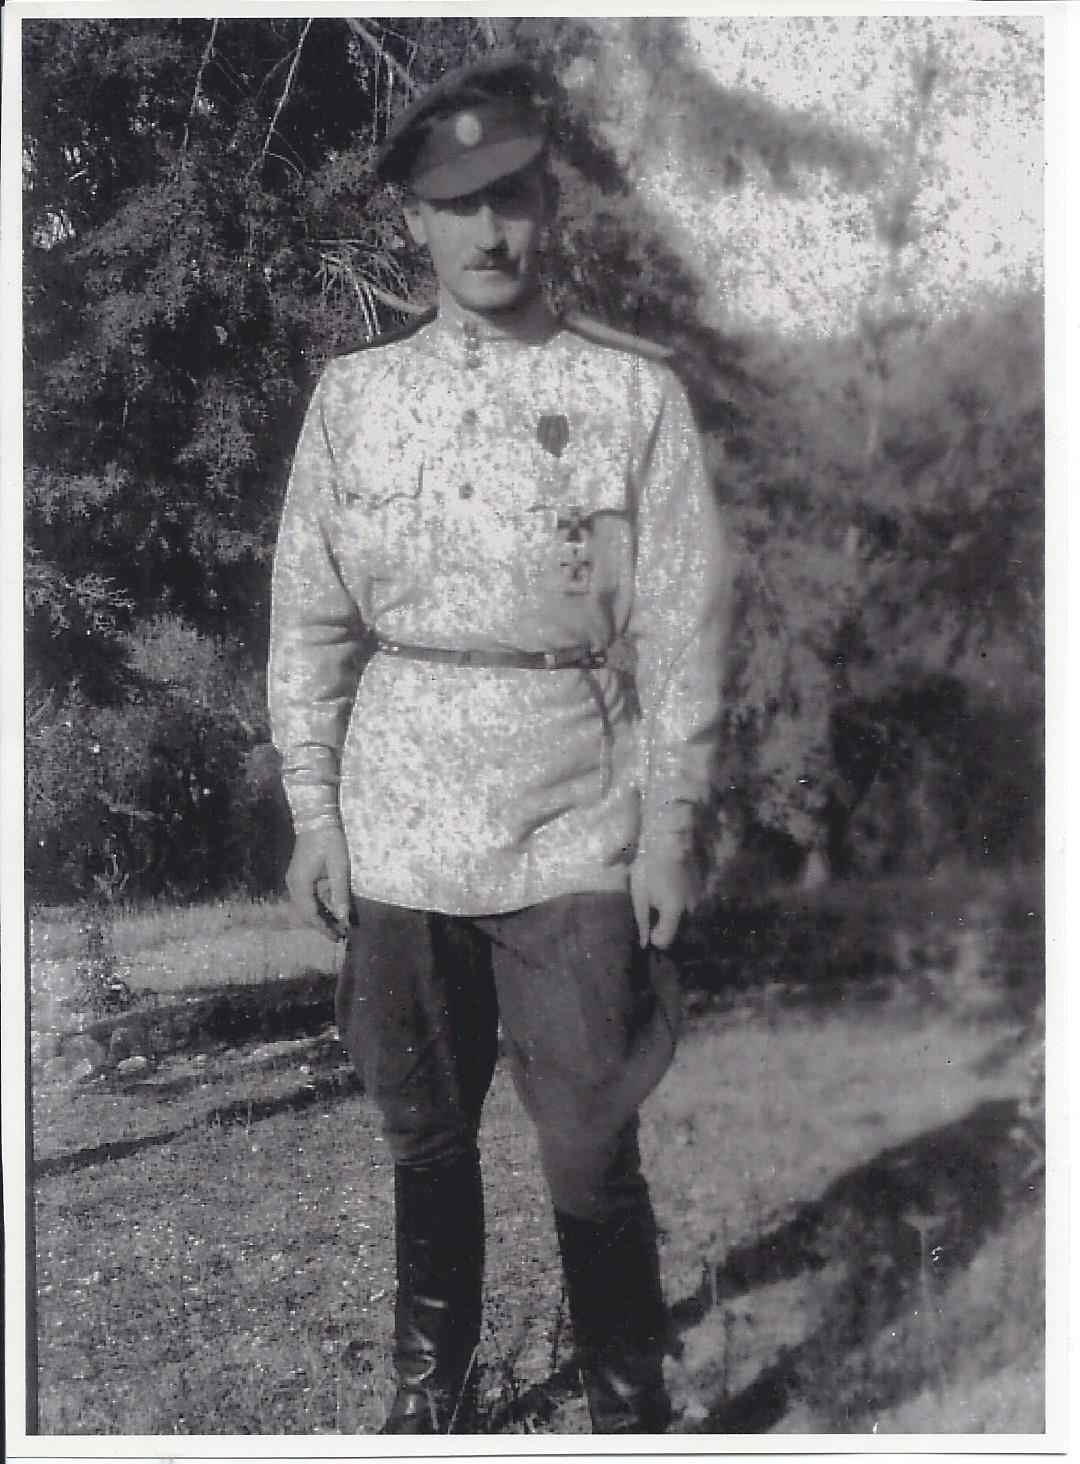 Полковник Белой армии Александр Фермор, 1921 год.